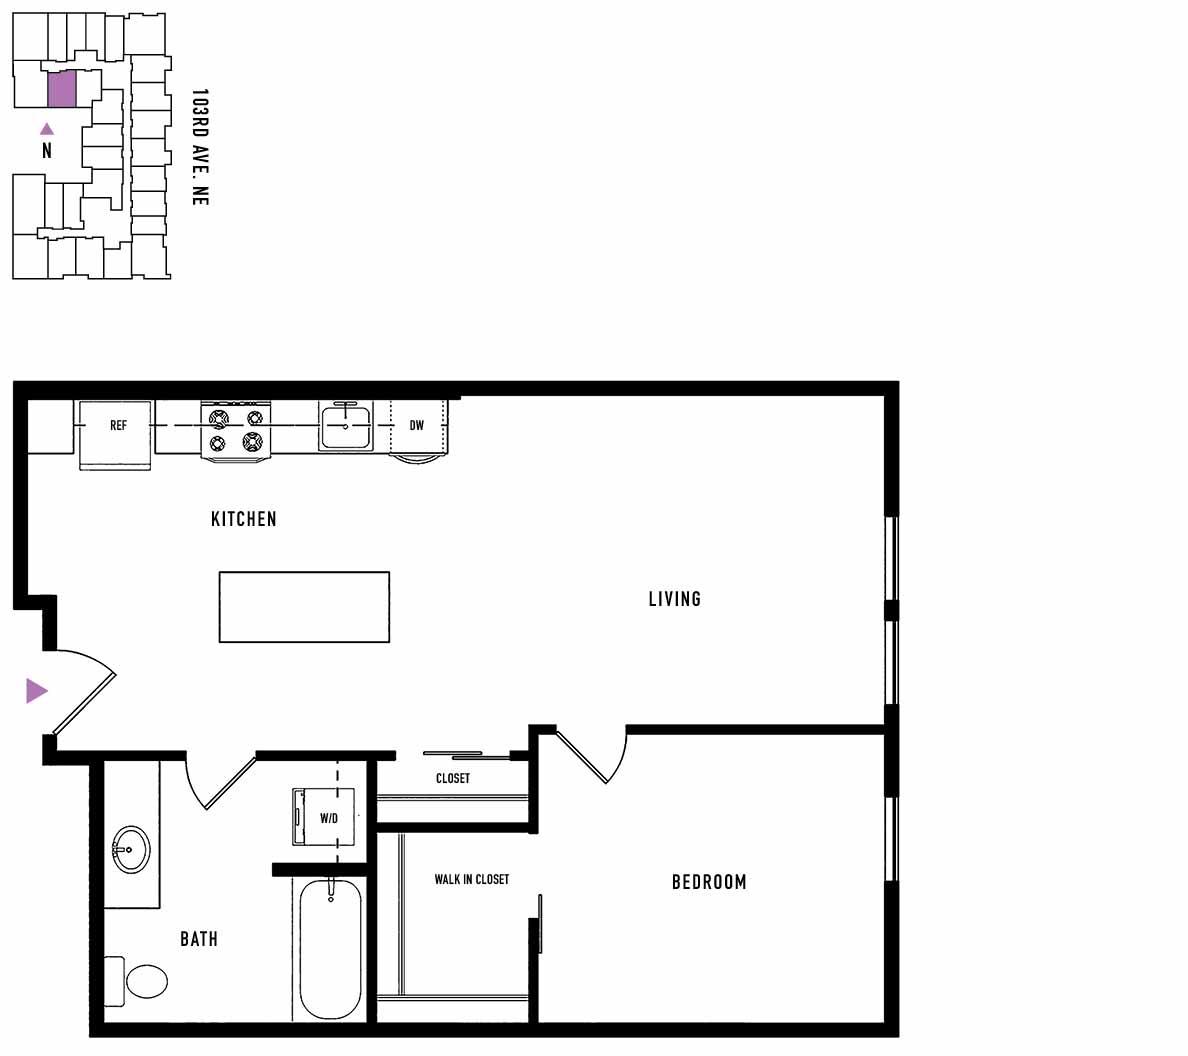 Mira_Flats_floorplans_final_white_2019_web13.jpg